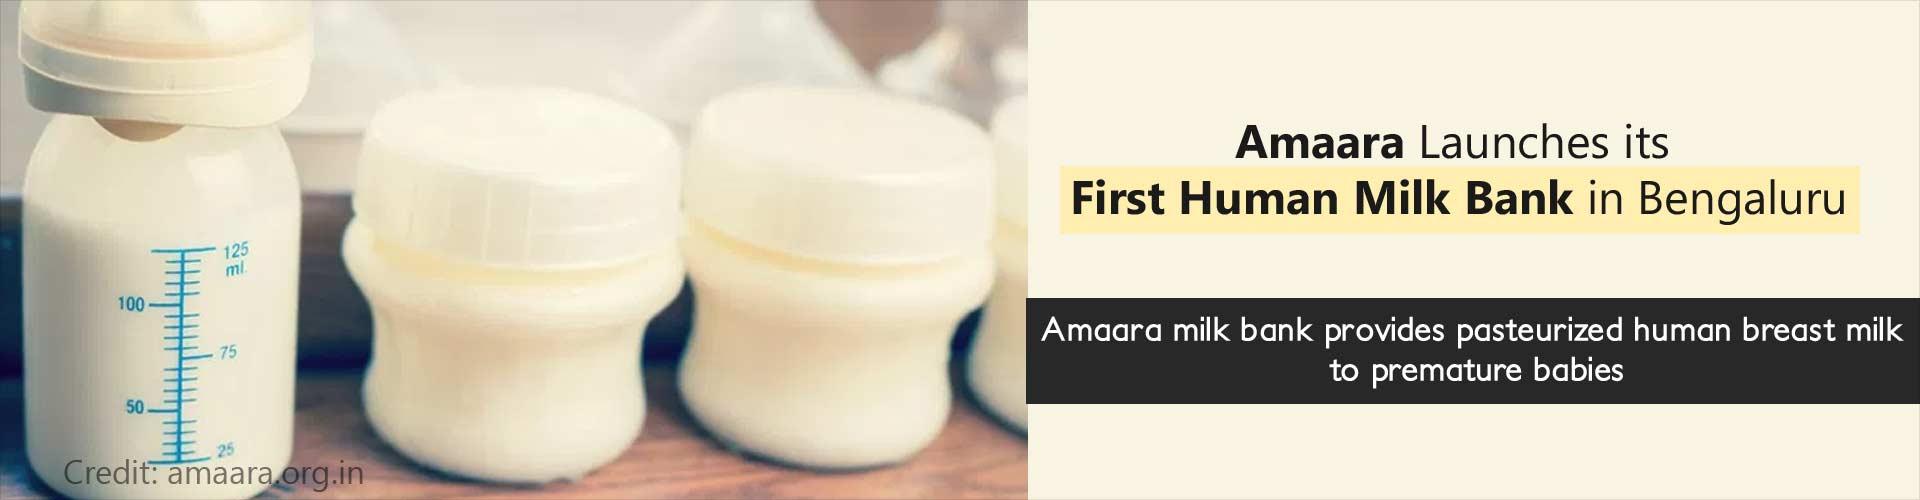 Amaara launches its first human milk bank in Bengaluru - Amaara milk bank provides pasteurized human breast milk to premature babies